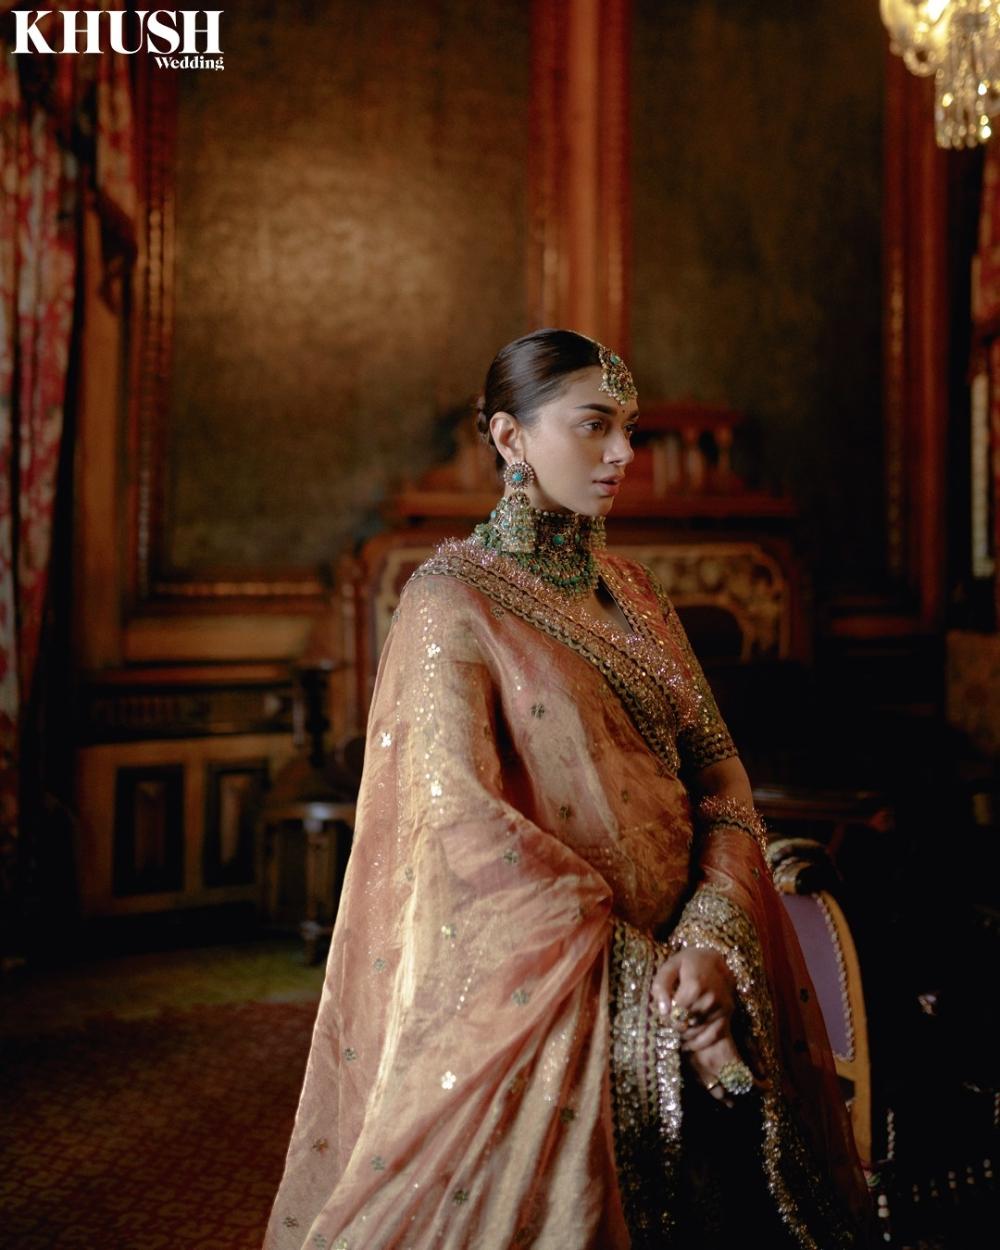 #Trending: Aditi Rao Hydari's Bridal Shoot For Sab